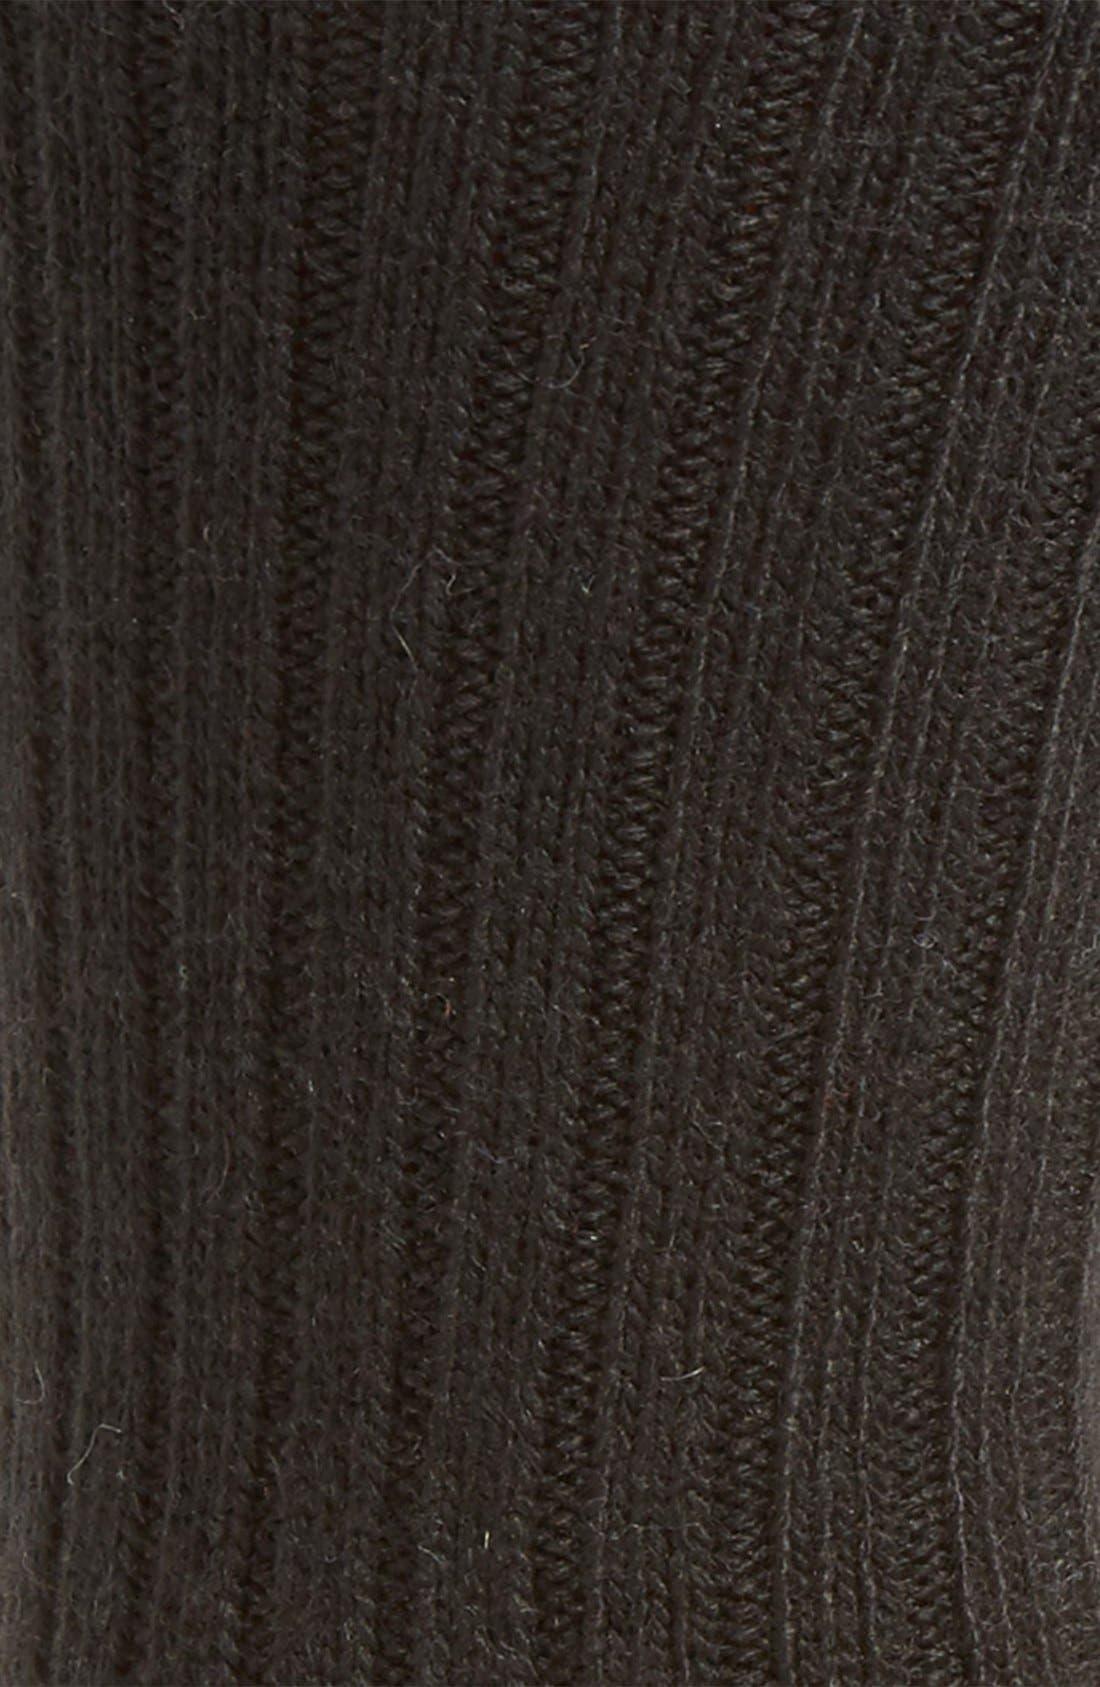 UGG 'Classic' Heathered Socks,                             Alternate thumbnail 2, color,                             001